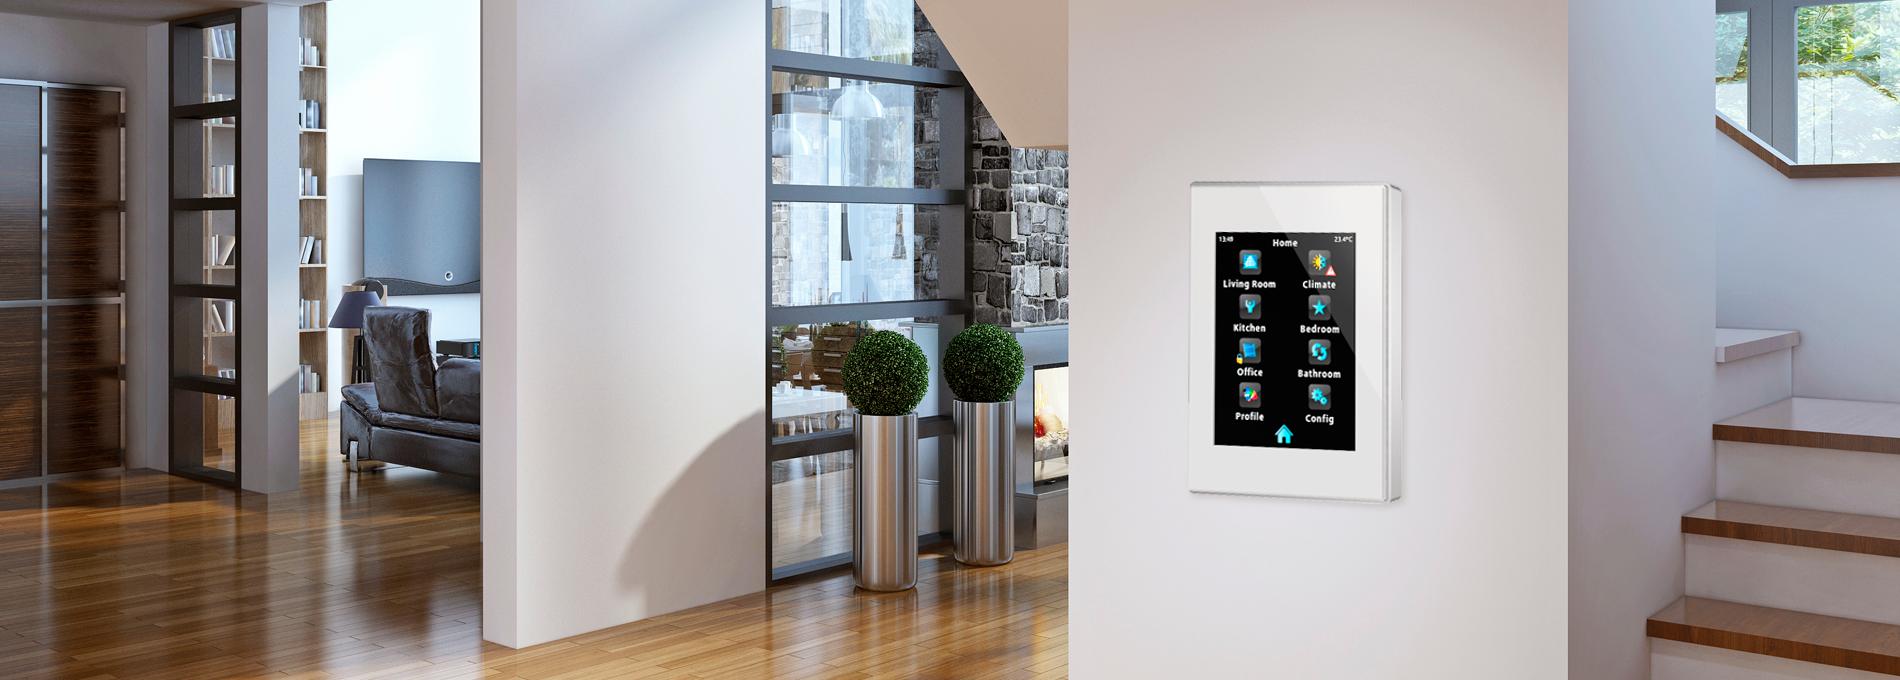 domotica-inteligente-electronica-hogar